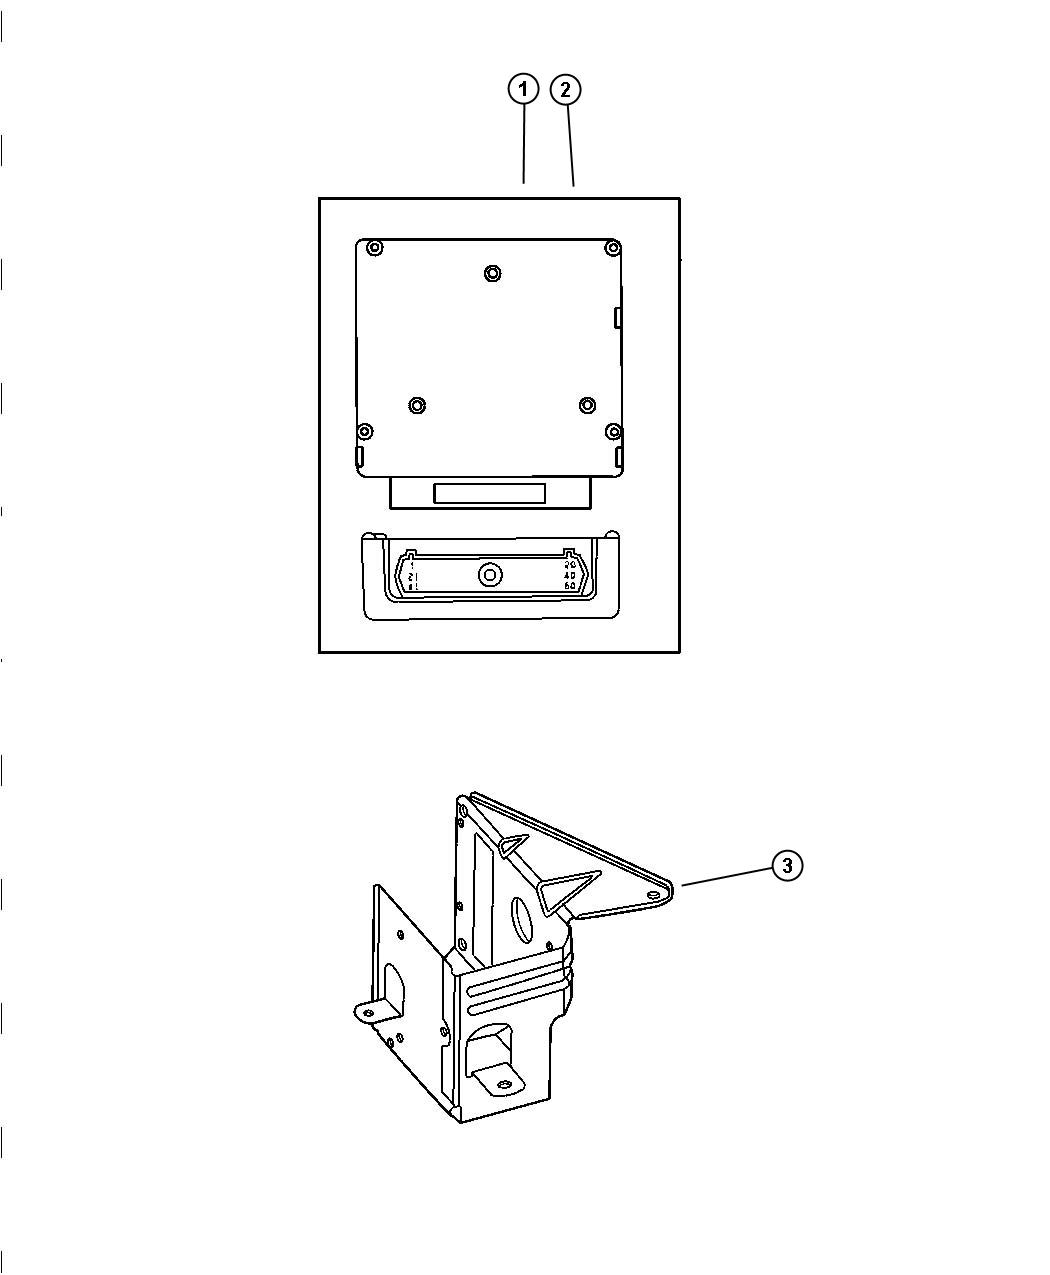 [DIAGRAM] 1995 Eagle Talon Engine Diagram FULL Version HD